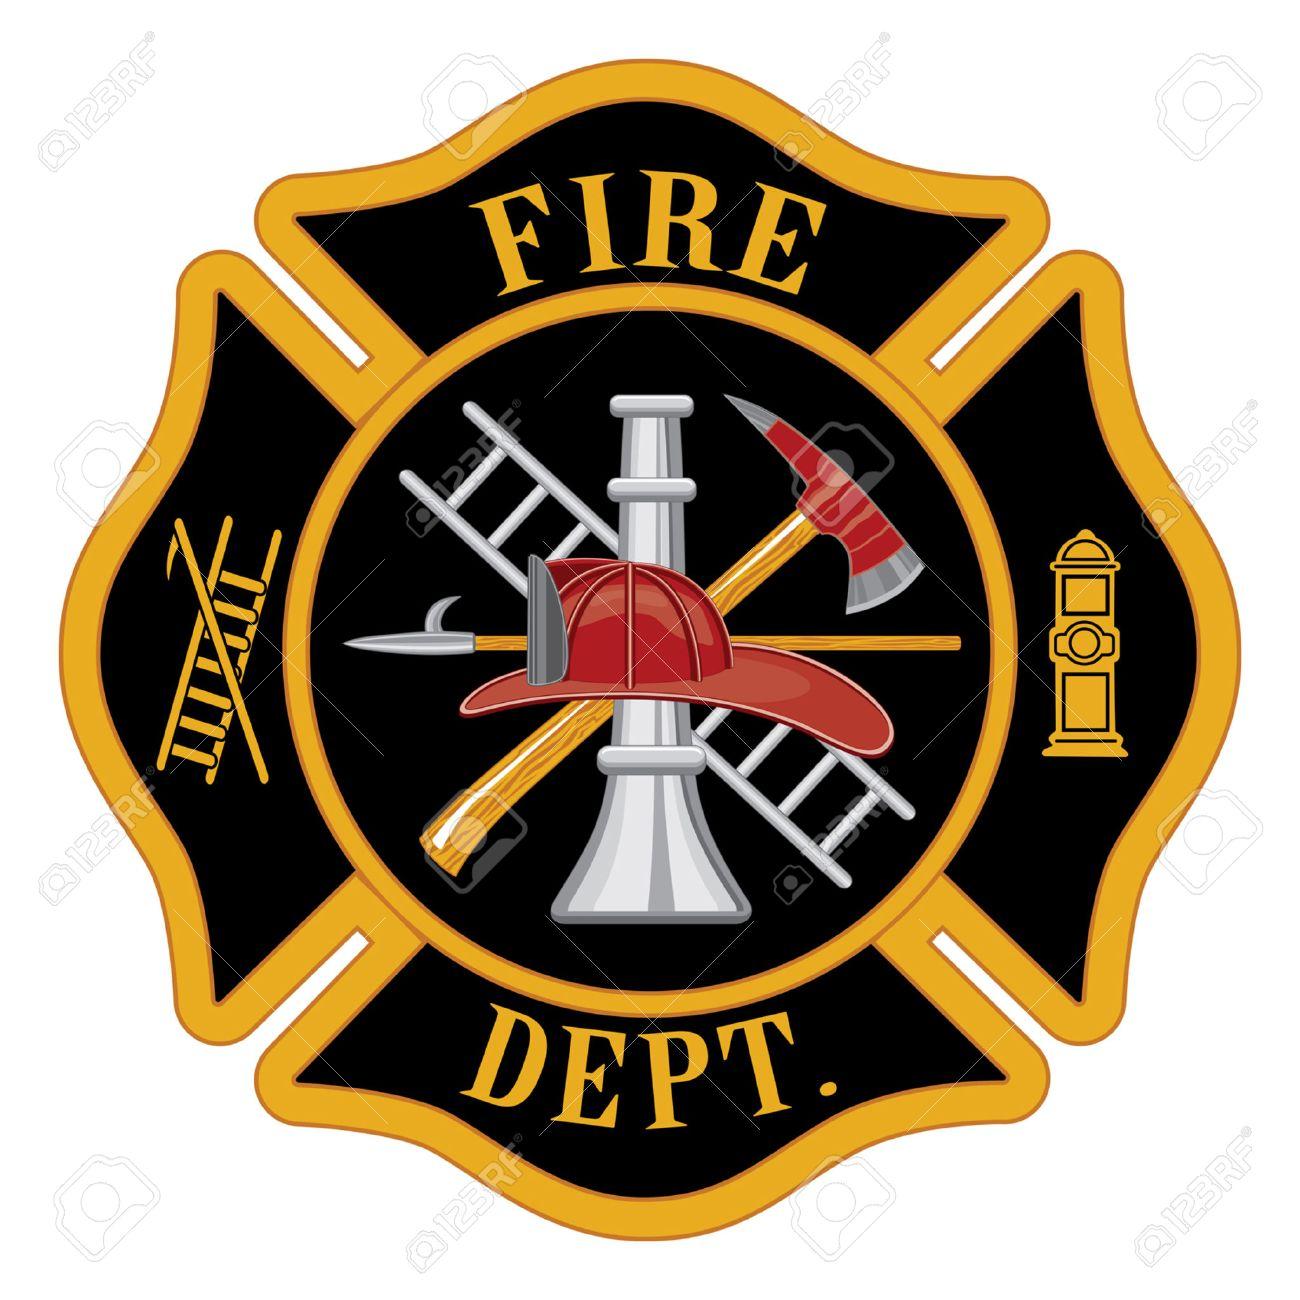 fire department or firefighters maltese cross symbol illustration rh 123rf com fire station symbols fire department symbols on buildings